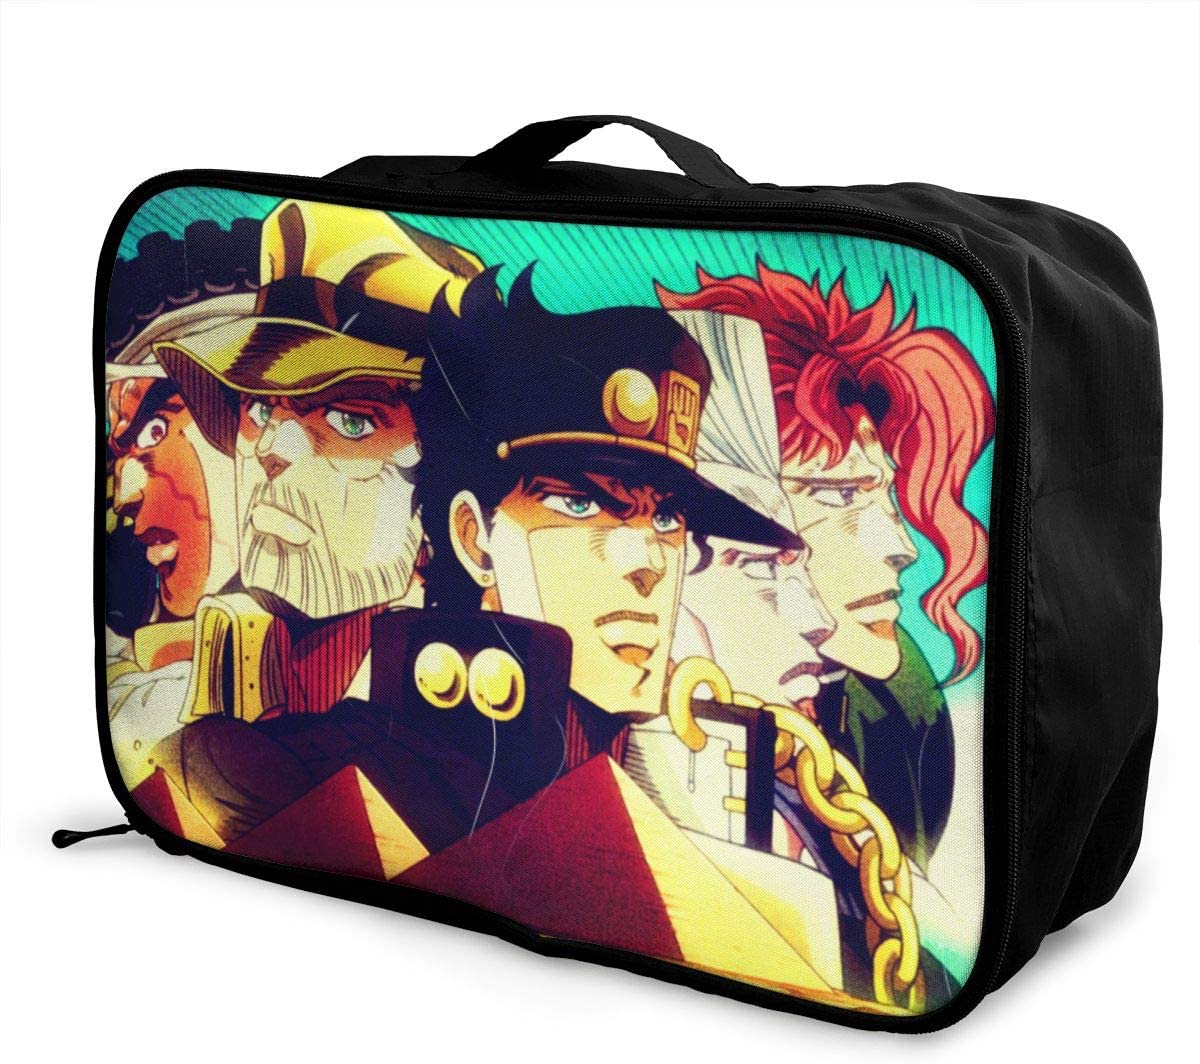 JoJos Bizarre Adventure Travel Luggage Storage Bag Duffel Bag Handle Makeup Bag Fashion Lightweight Large Capacity Portable Luggage Bag